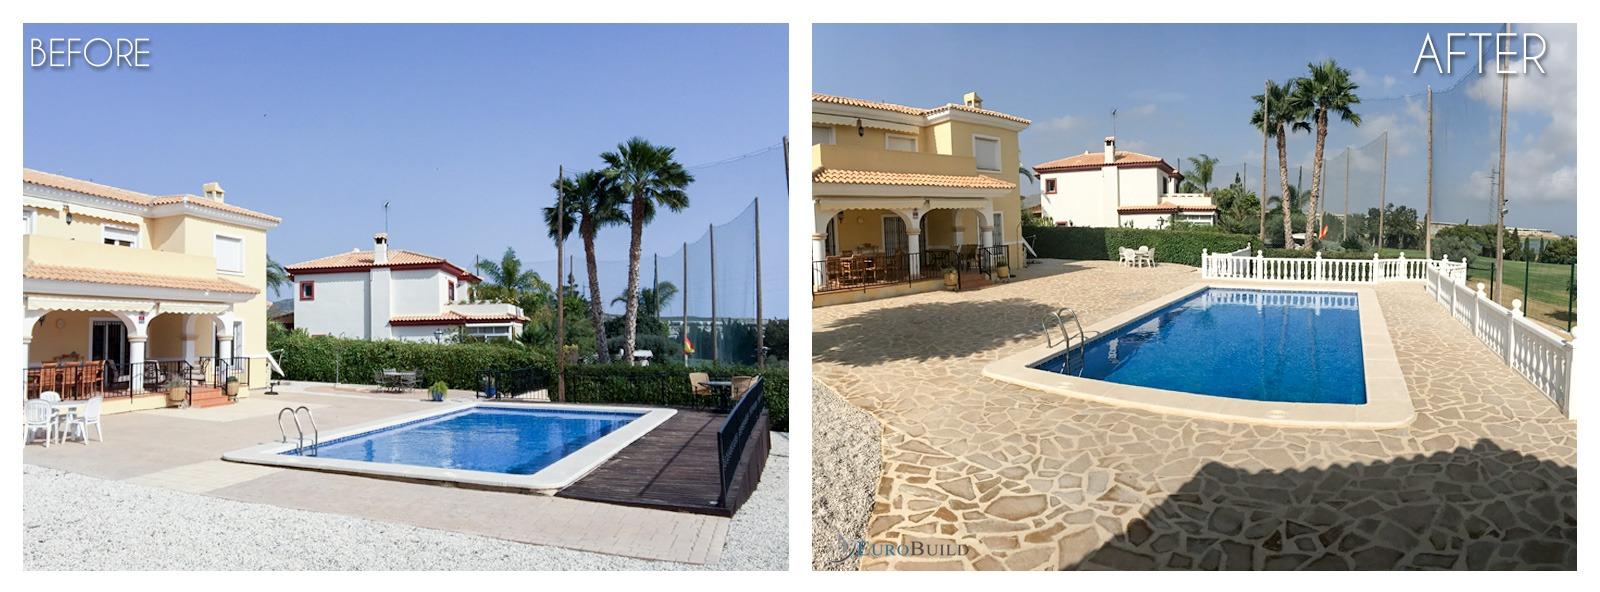 Swimming pool, terrace, renovation